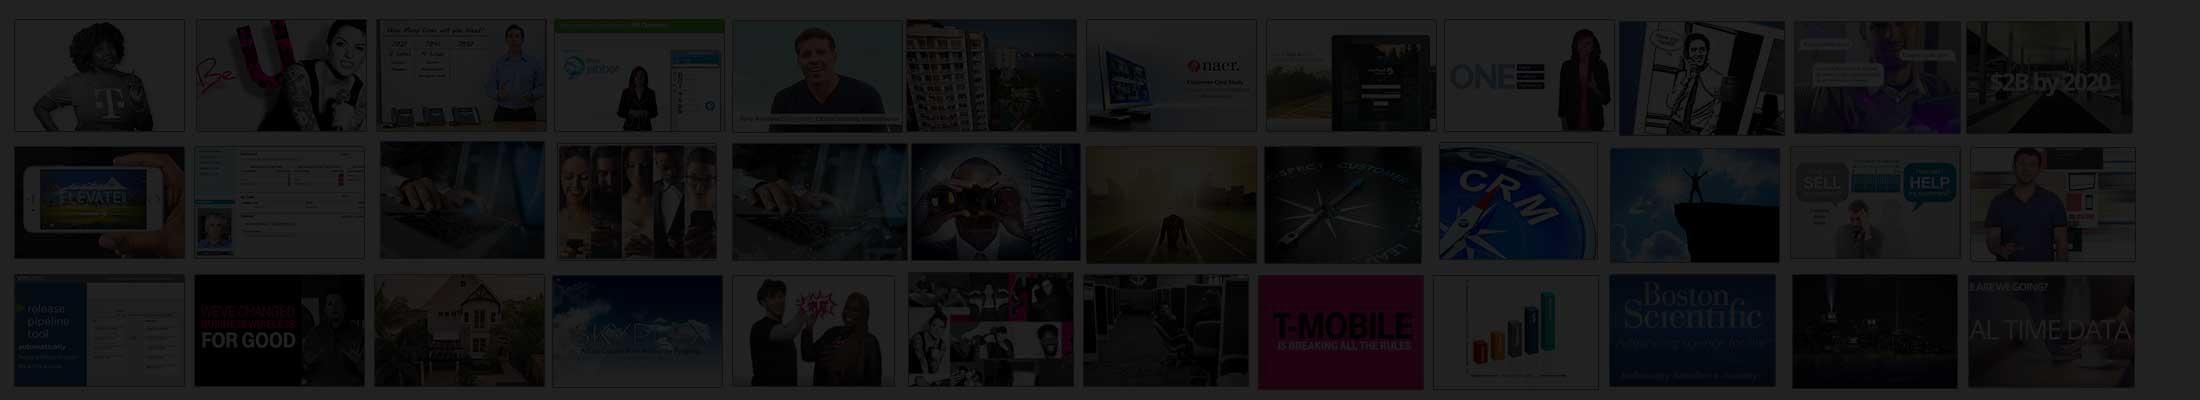 Naples instructional video, Website companies naples fl, Naples website design, and production, Naples fl